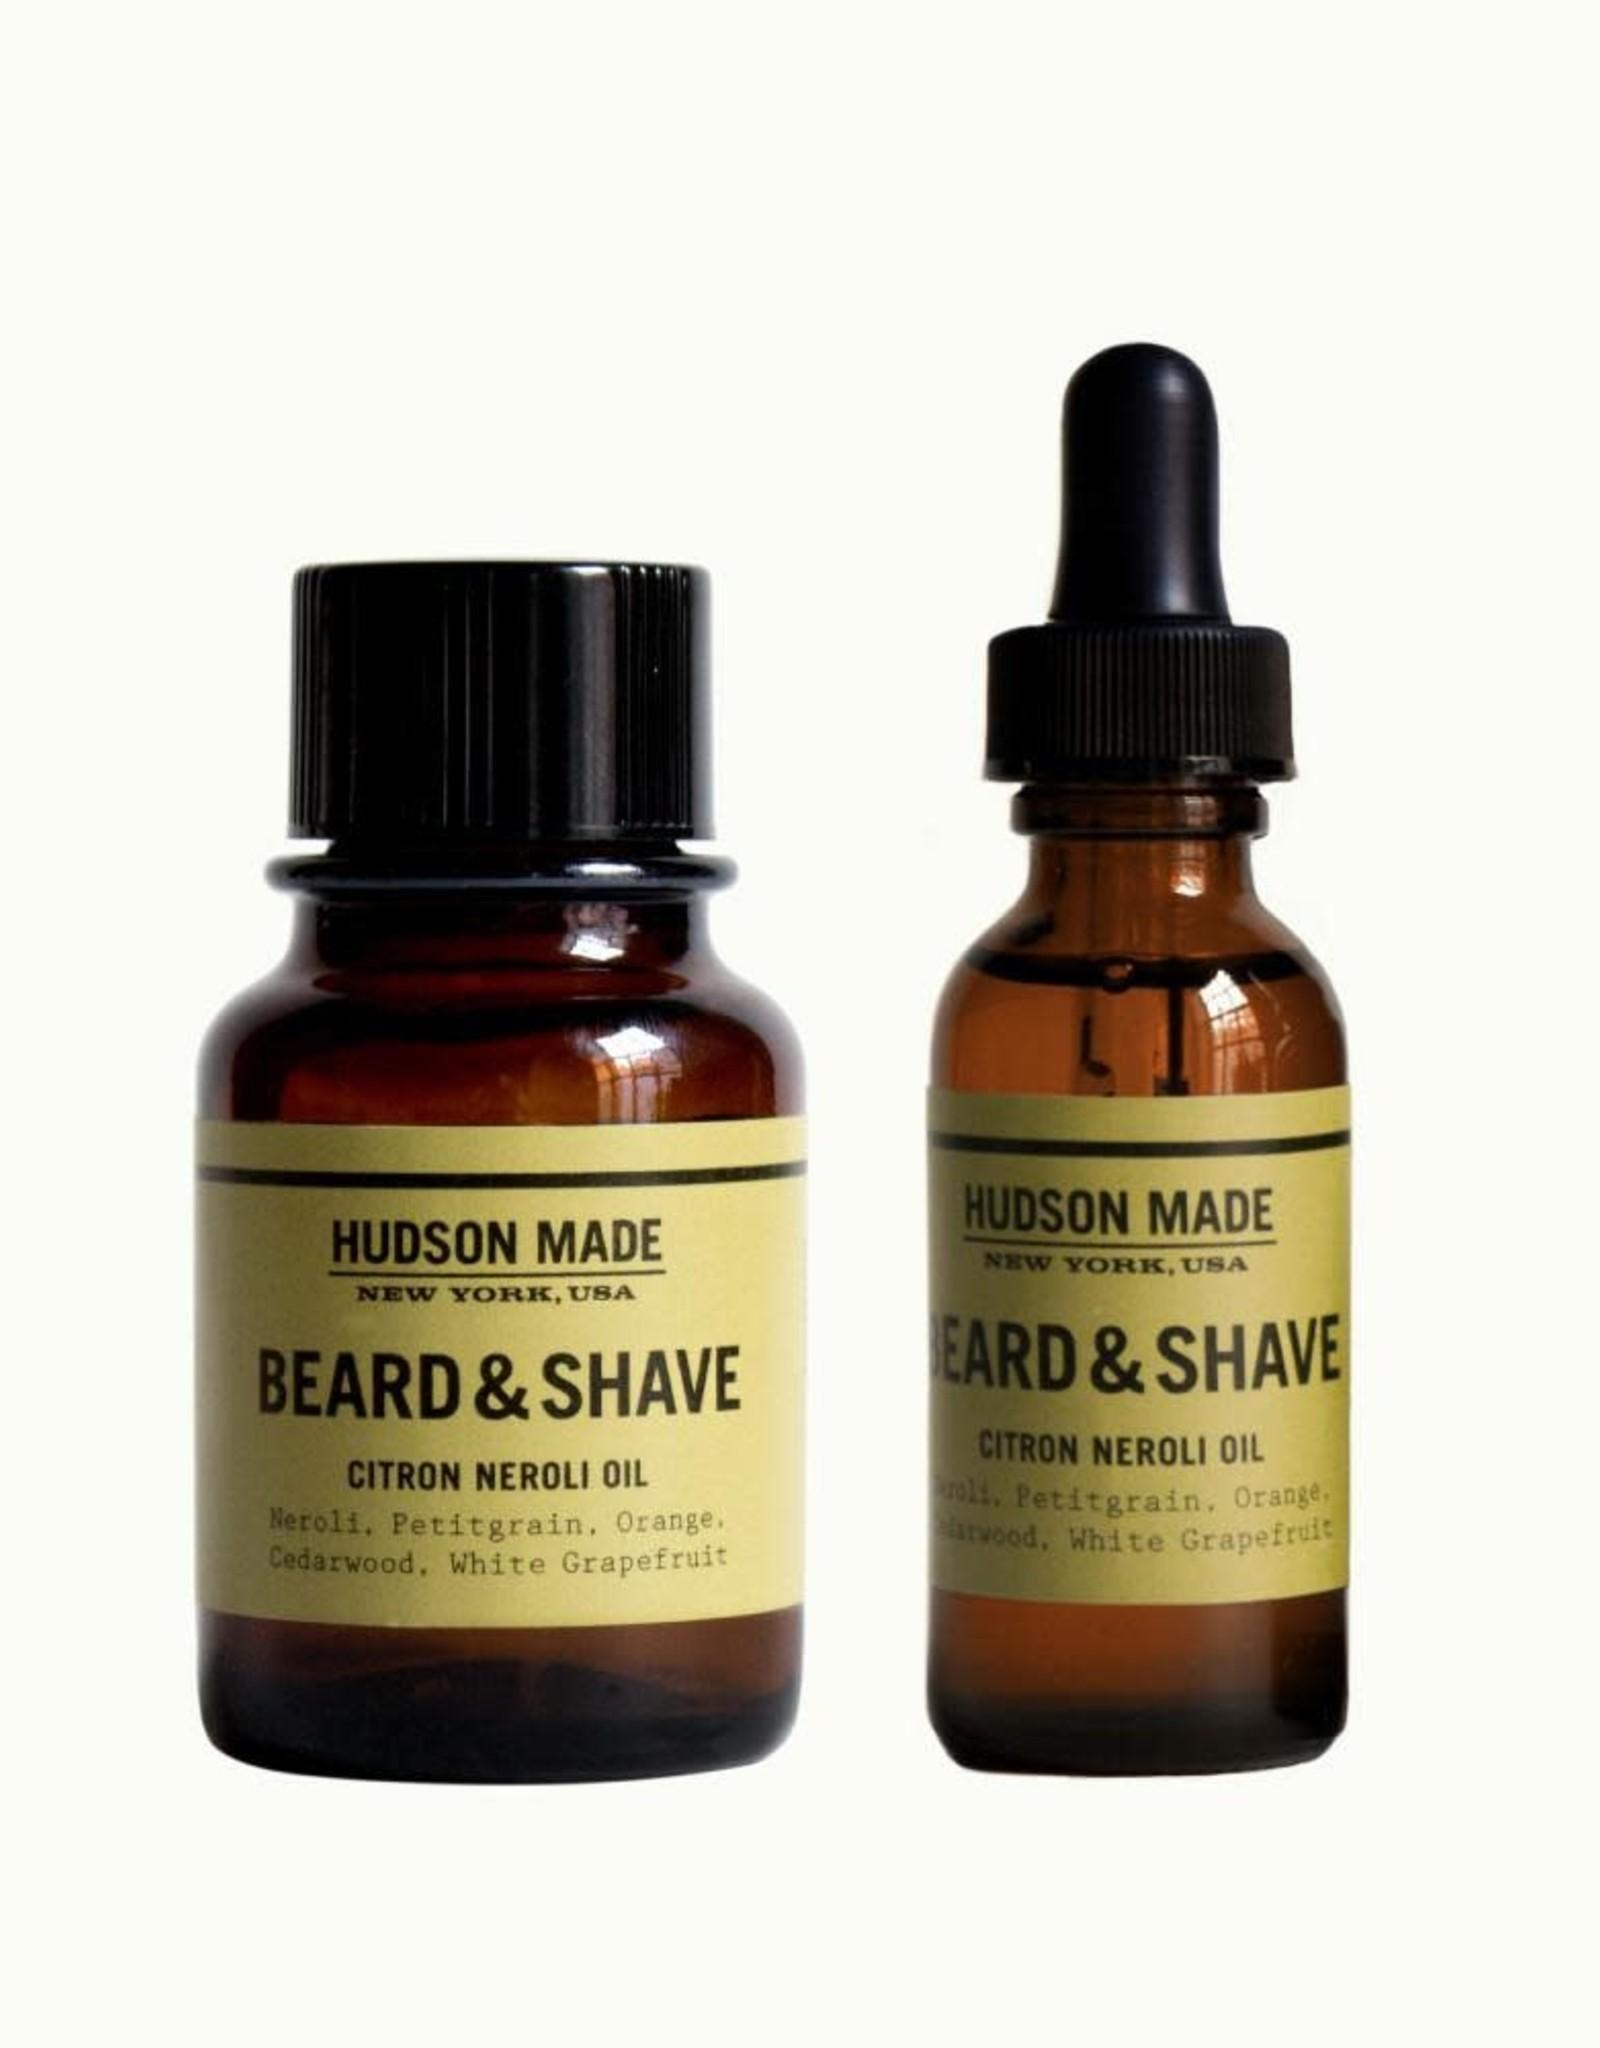 Hudson Made Inc. Citron Neroli Oil